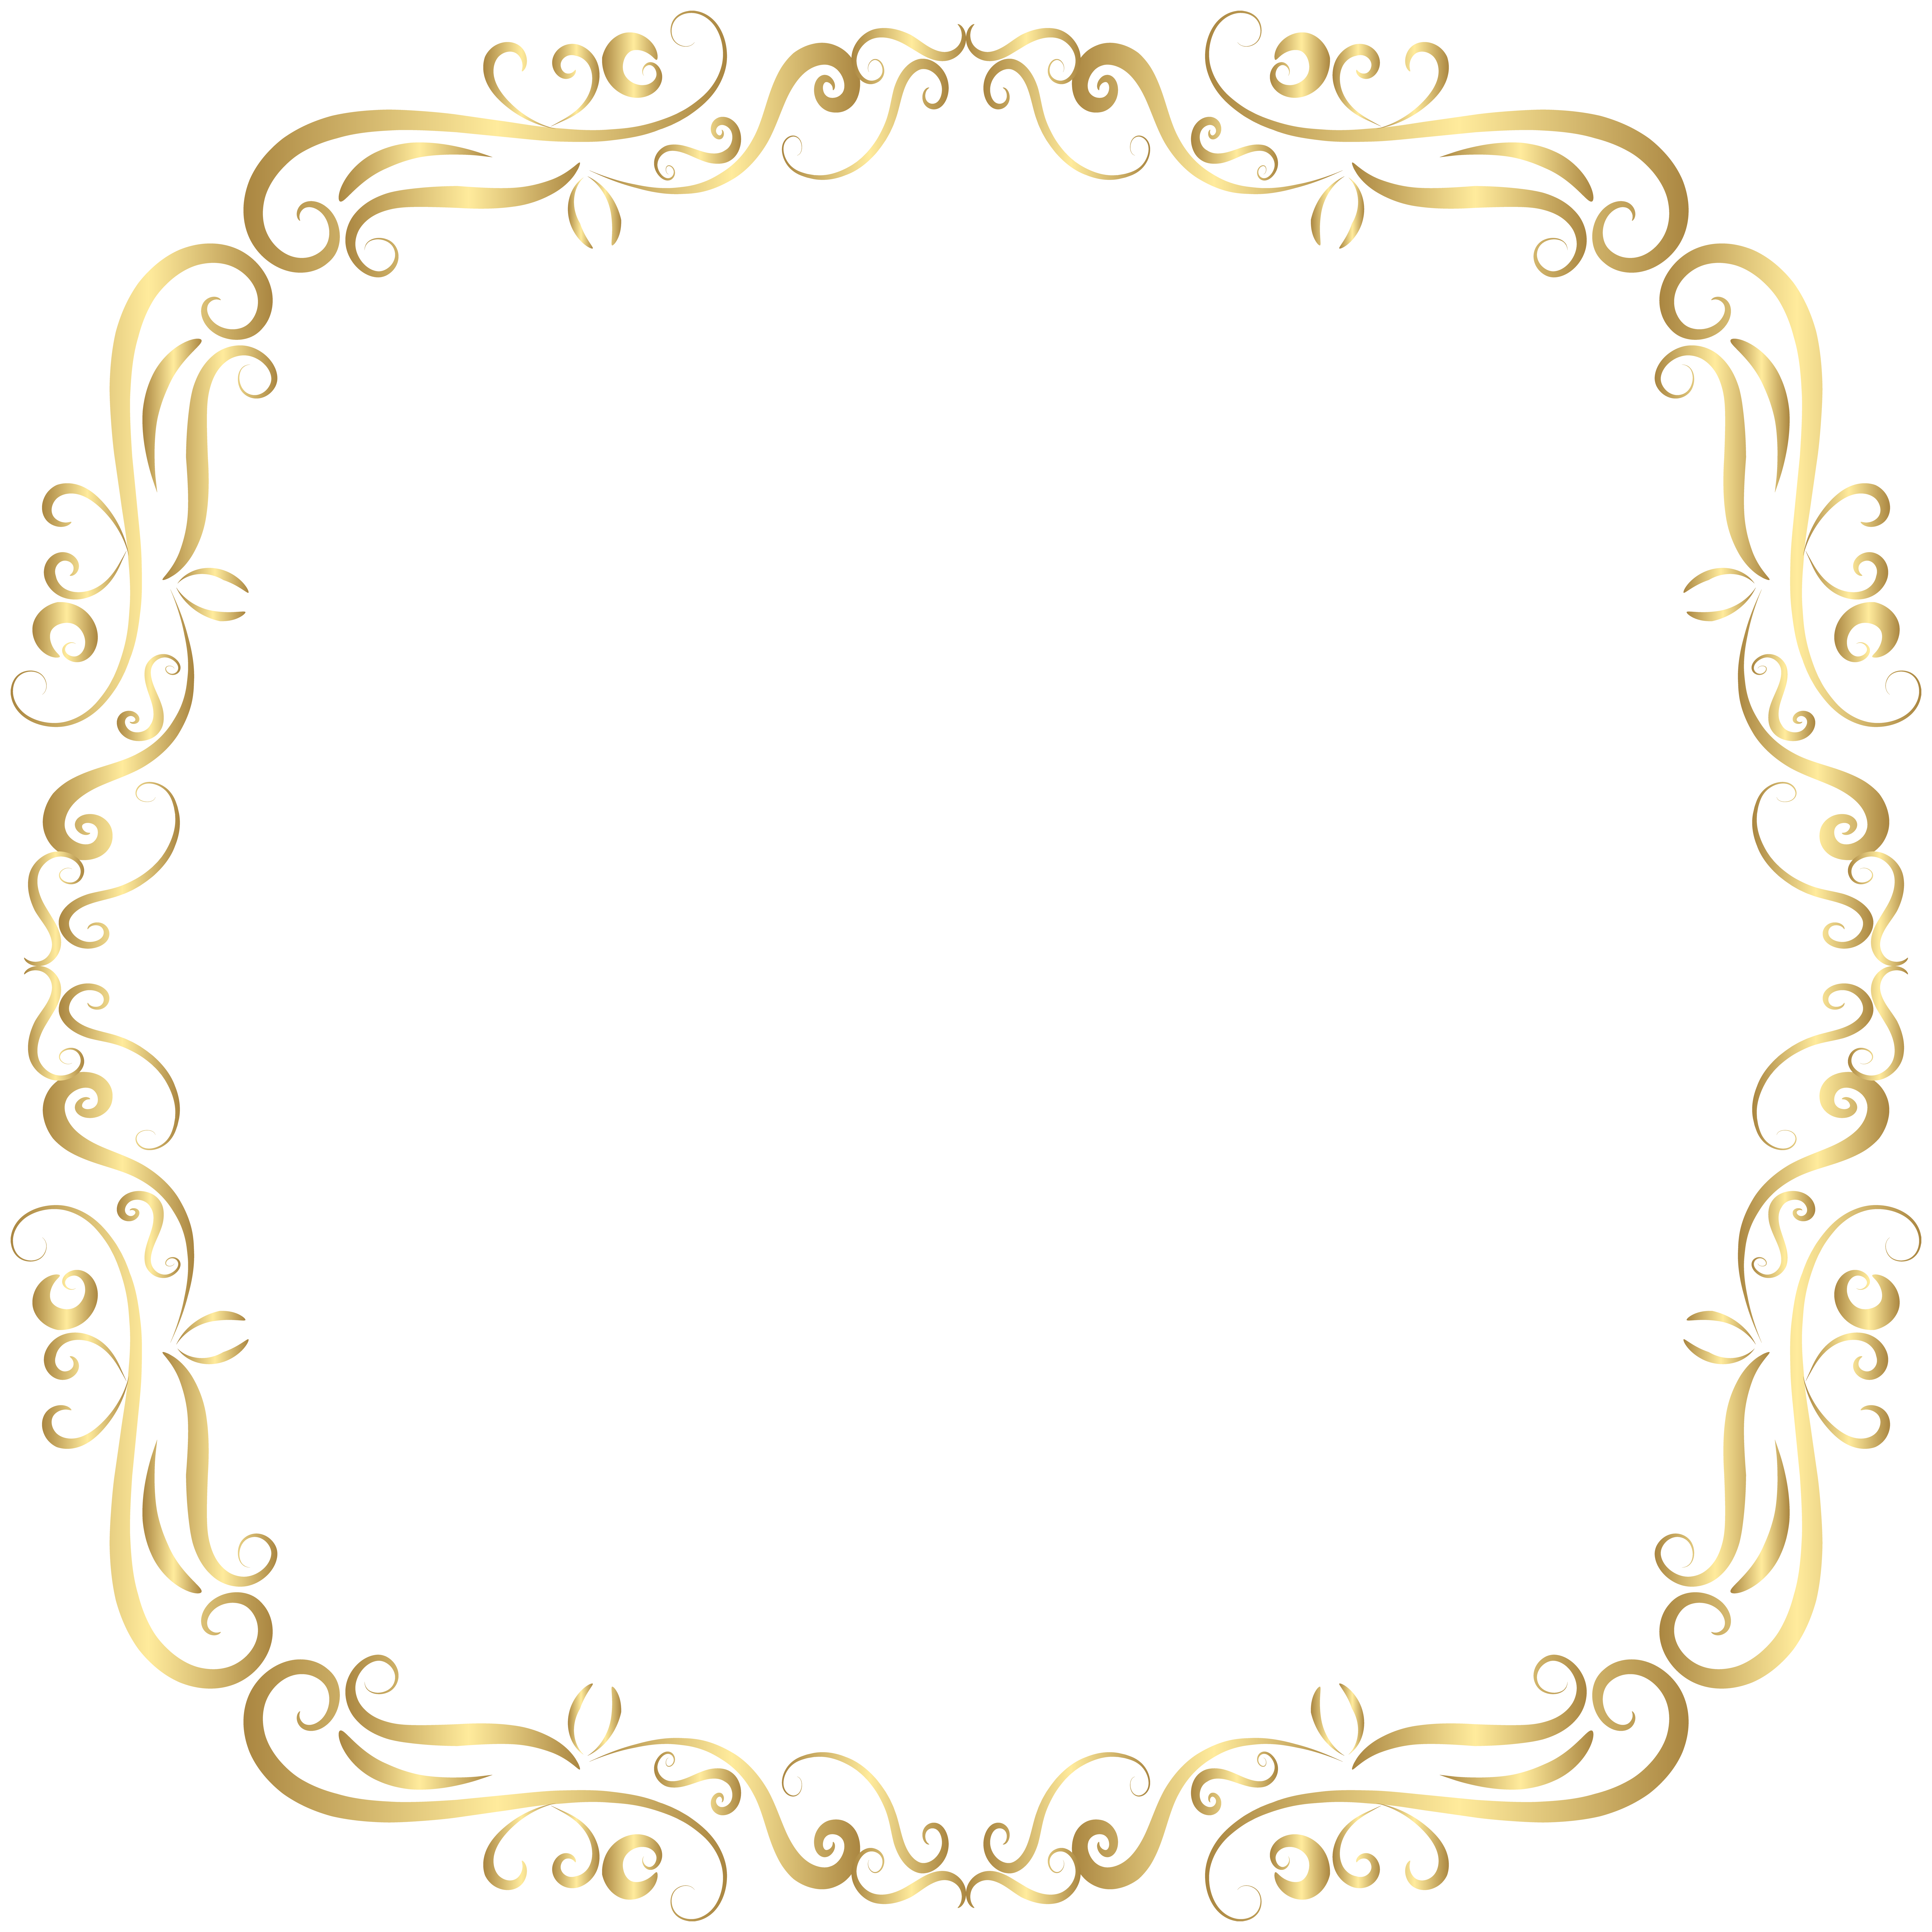 Frame decoration clipart clip freeuse Border Frame Decor PNG Clip Art Image   Gallery Yopriceville - High ... clip freeuse